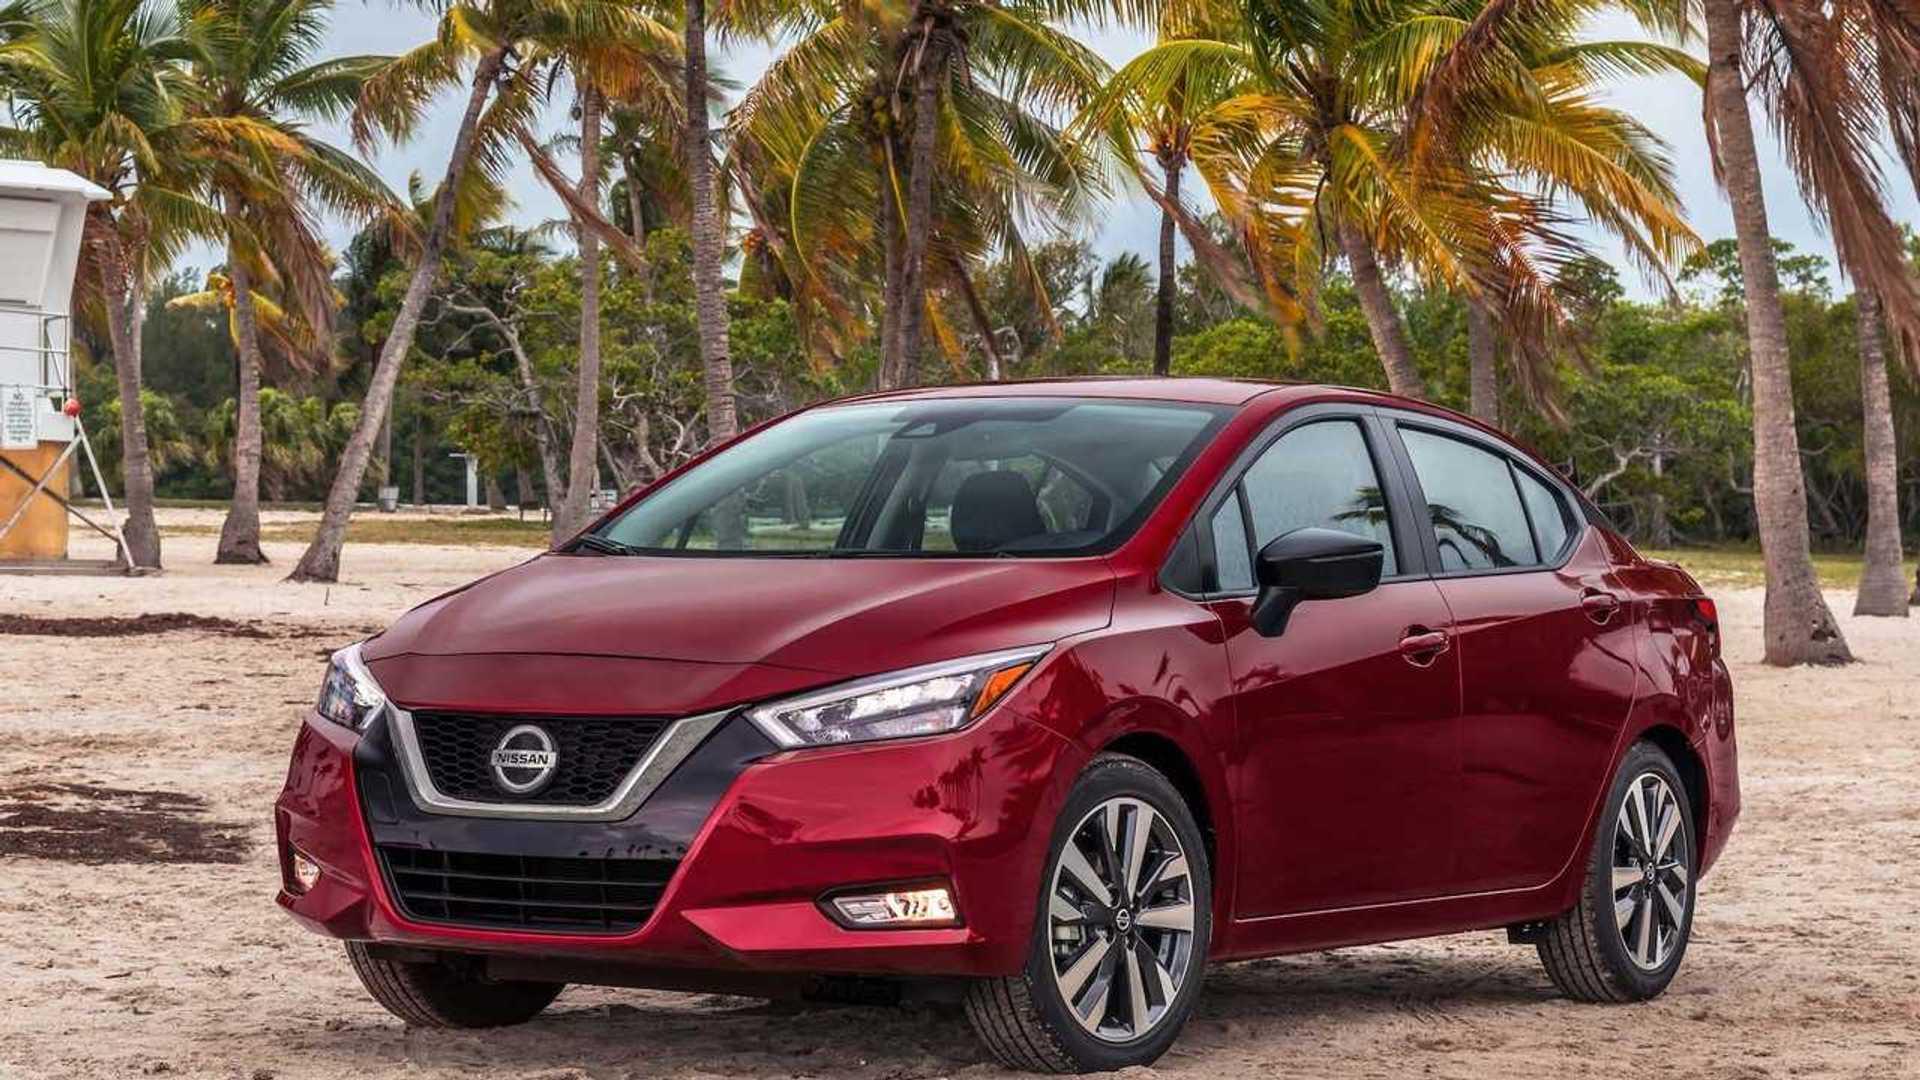 2020 Nissan Versa Starts At 14 730 Sporty Sr Costs 18 240